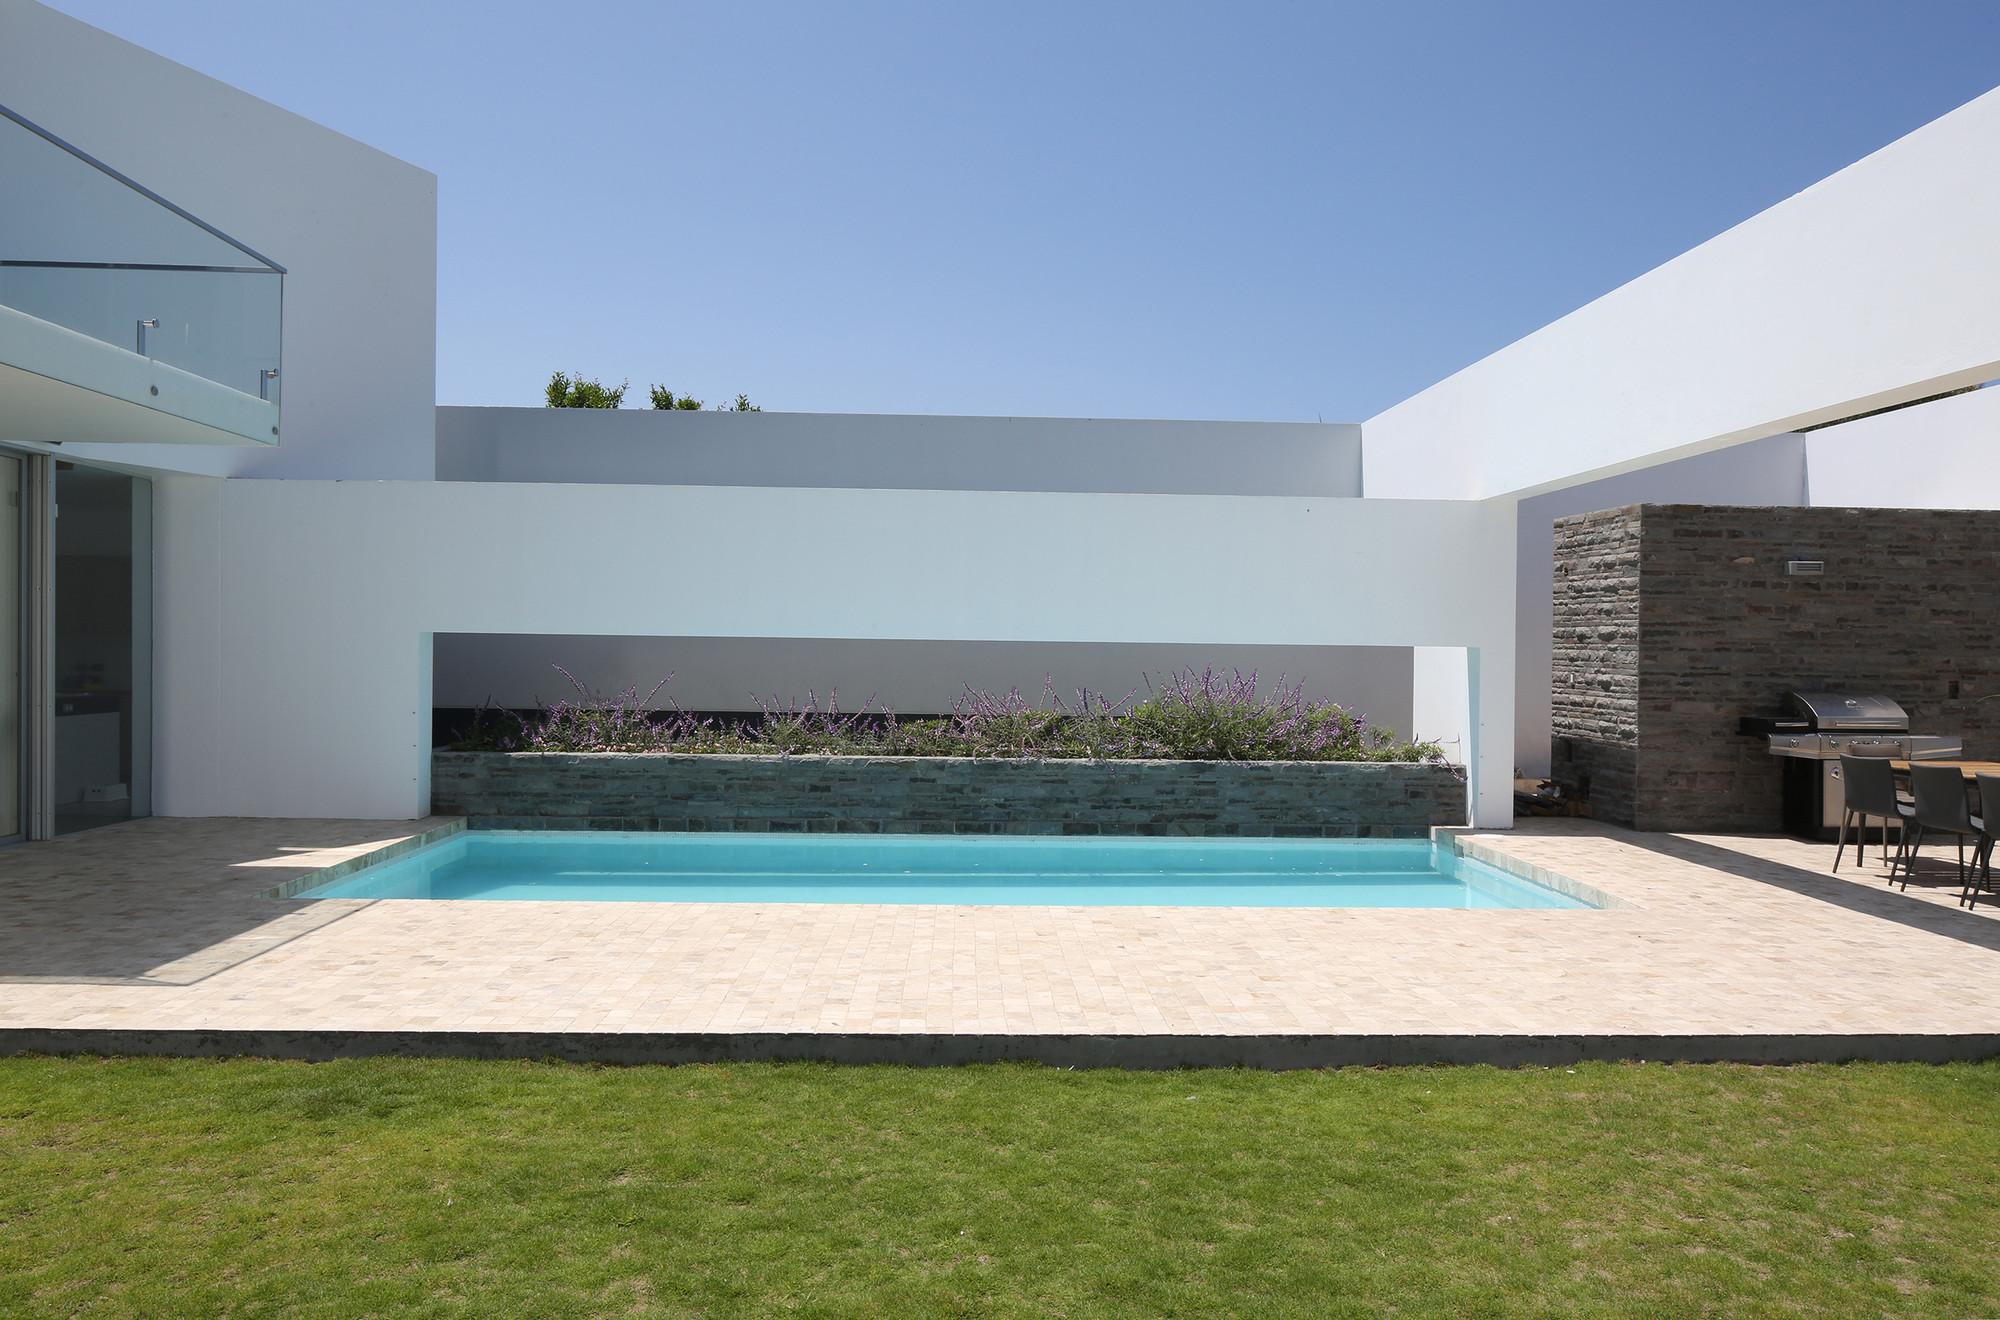 Galer a de casa patios riofrio rodrigo arquitectos 11 - Houses large patios ...